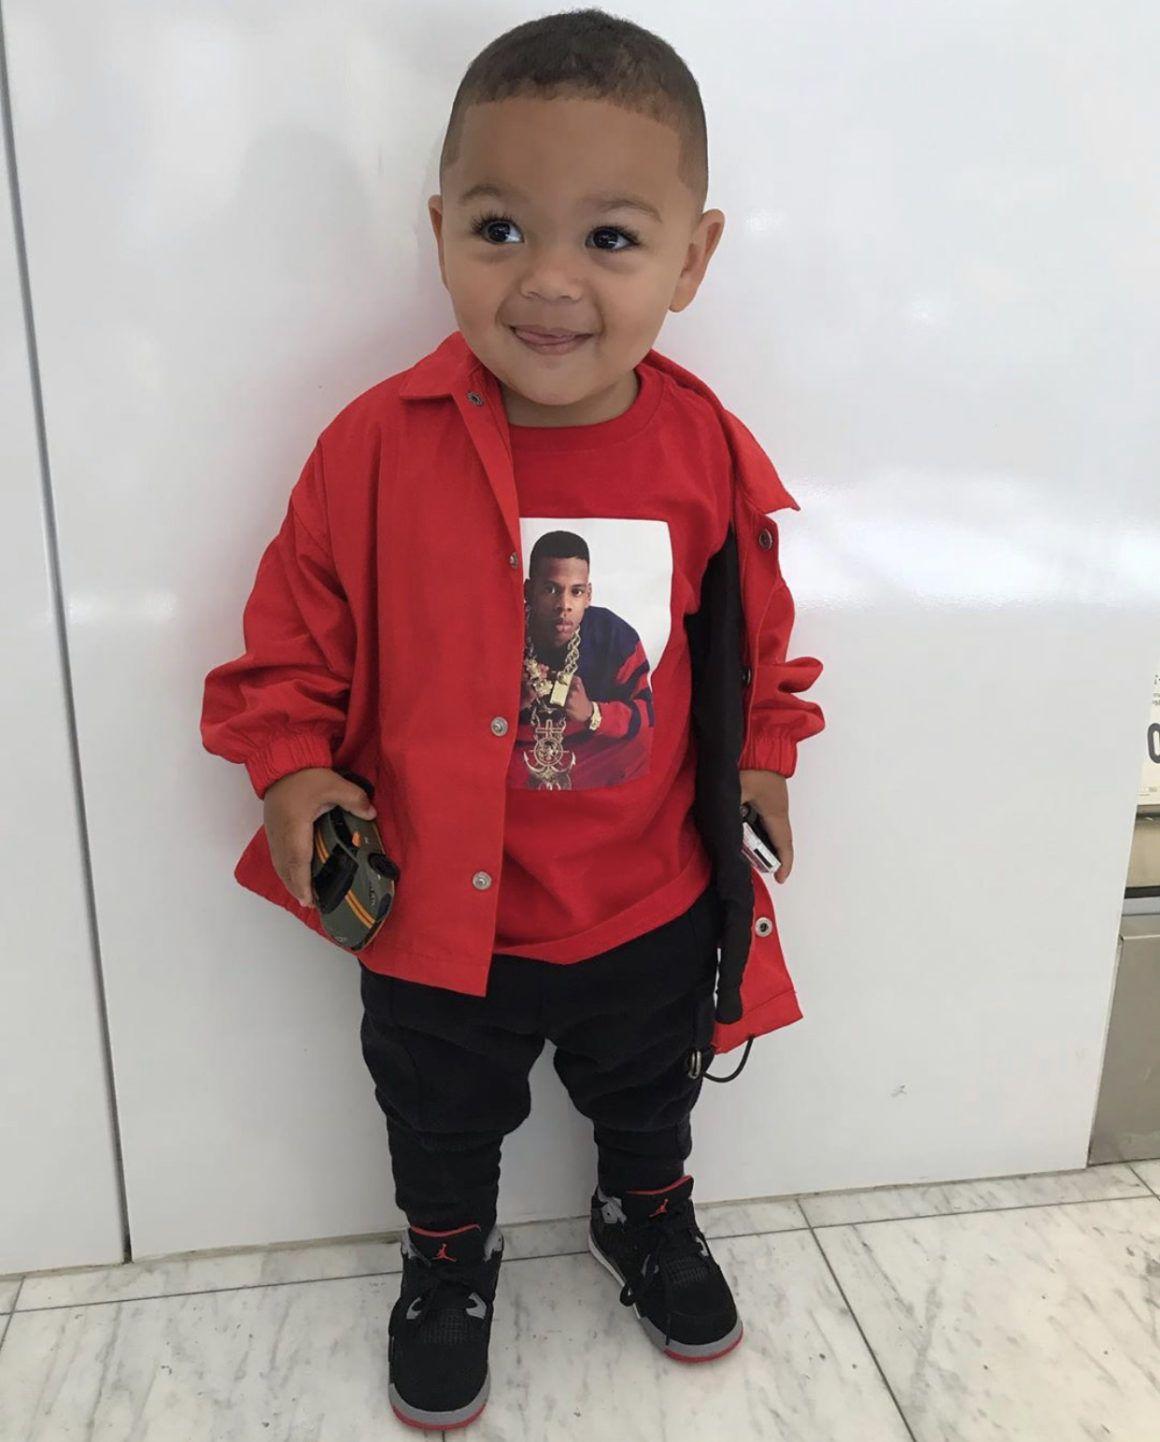 Fashion Bomb Kid of the Week: Cruz Simms from San